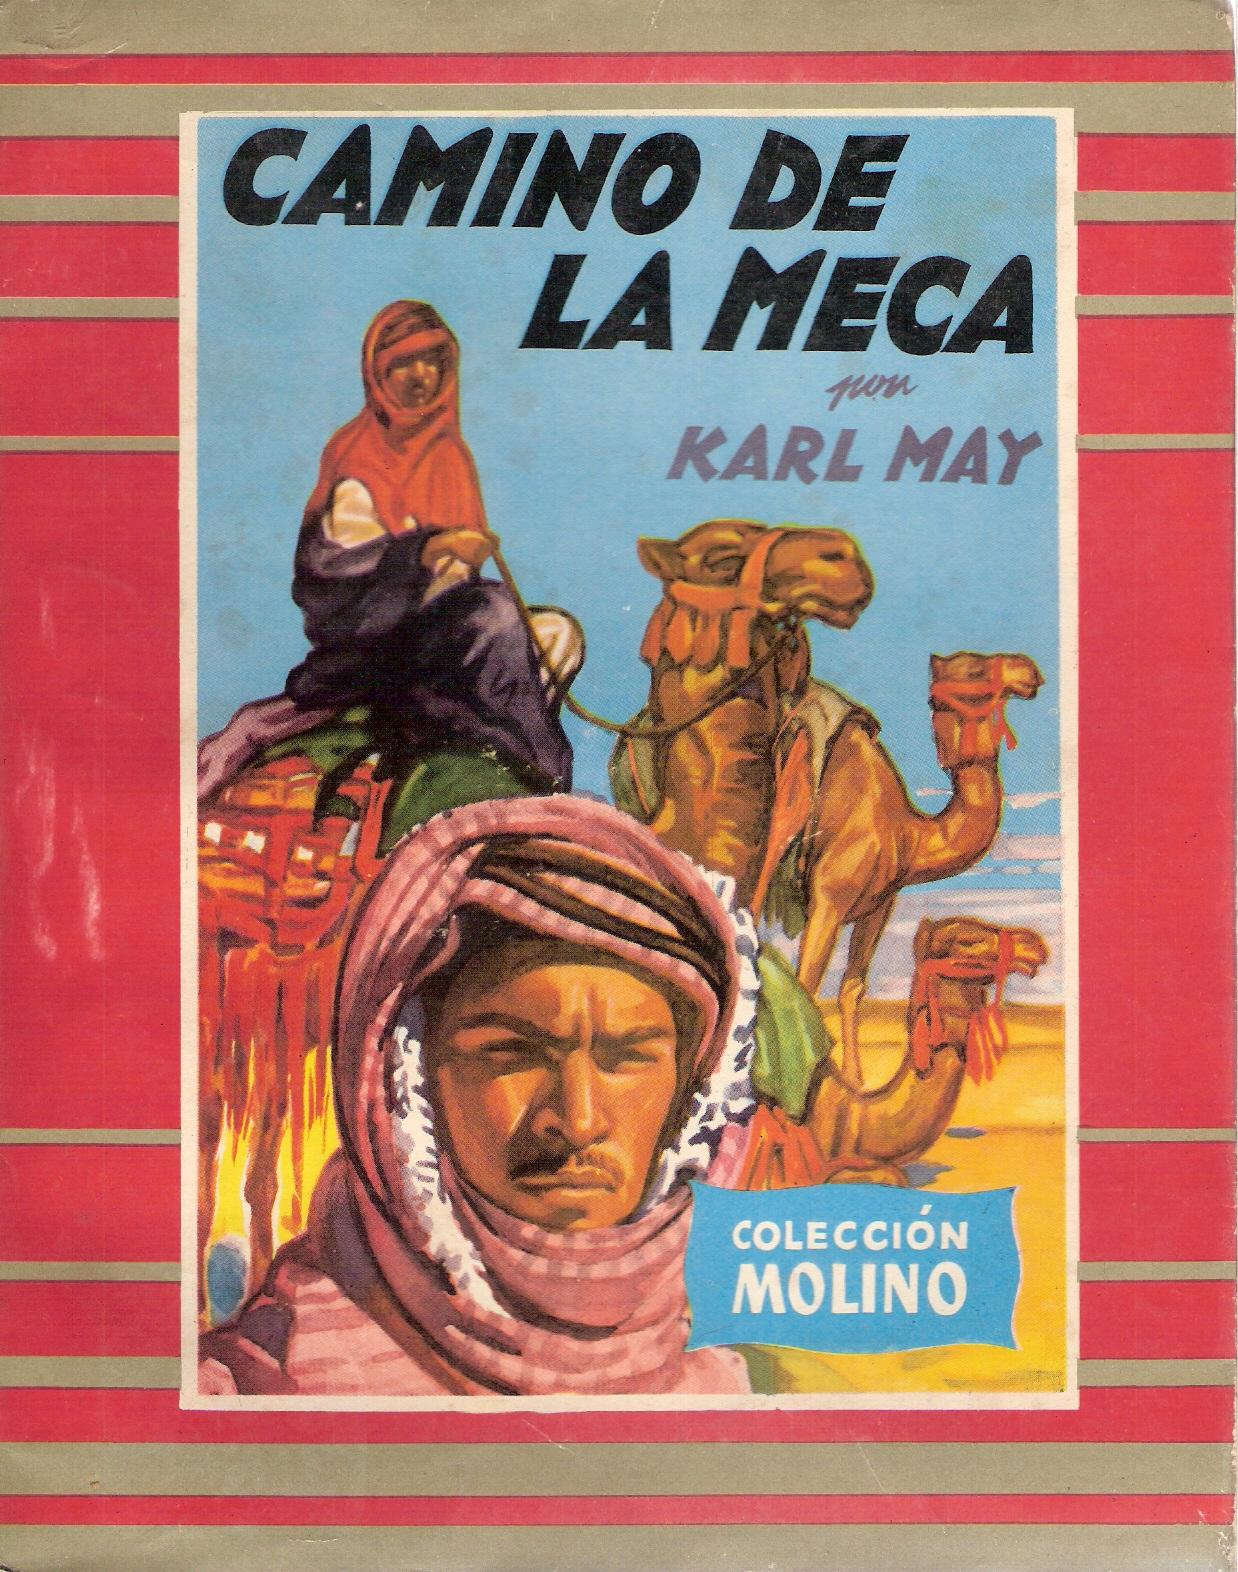 Camino de la Meca